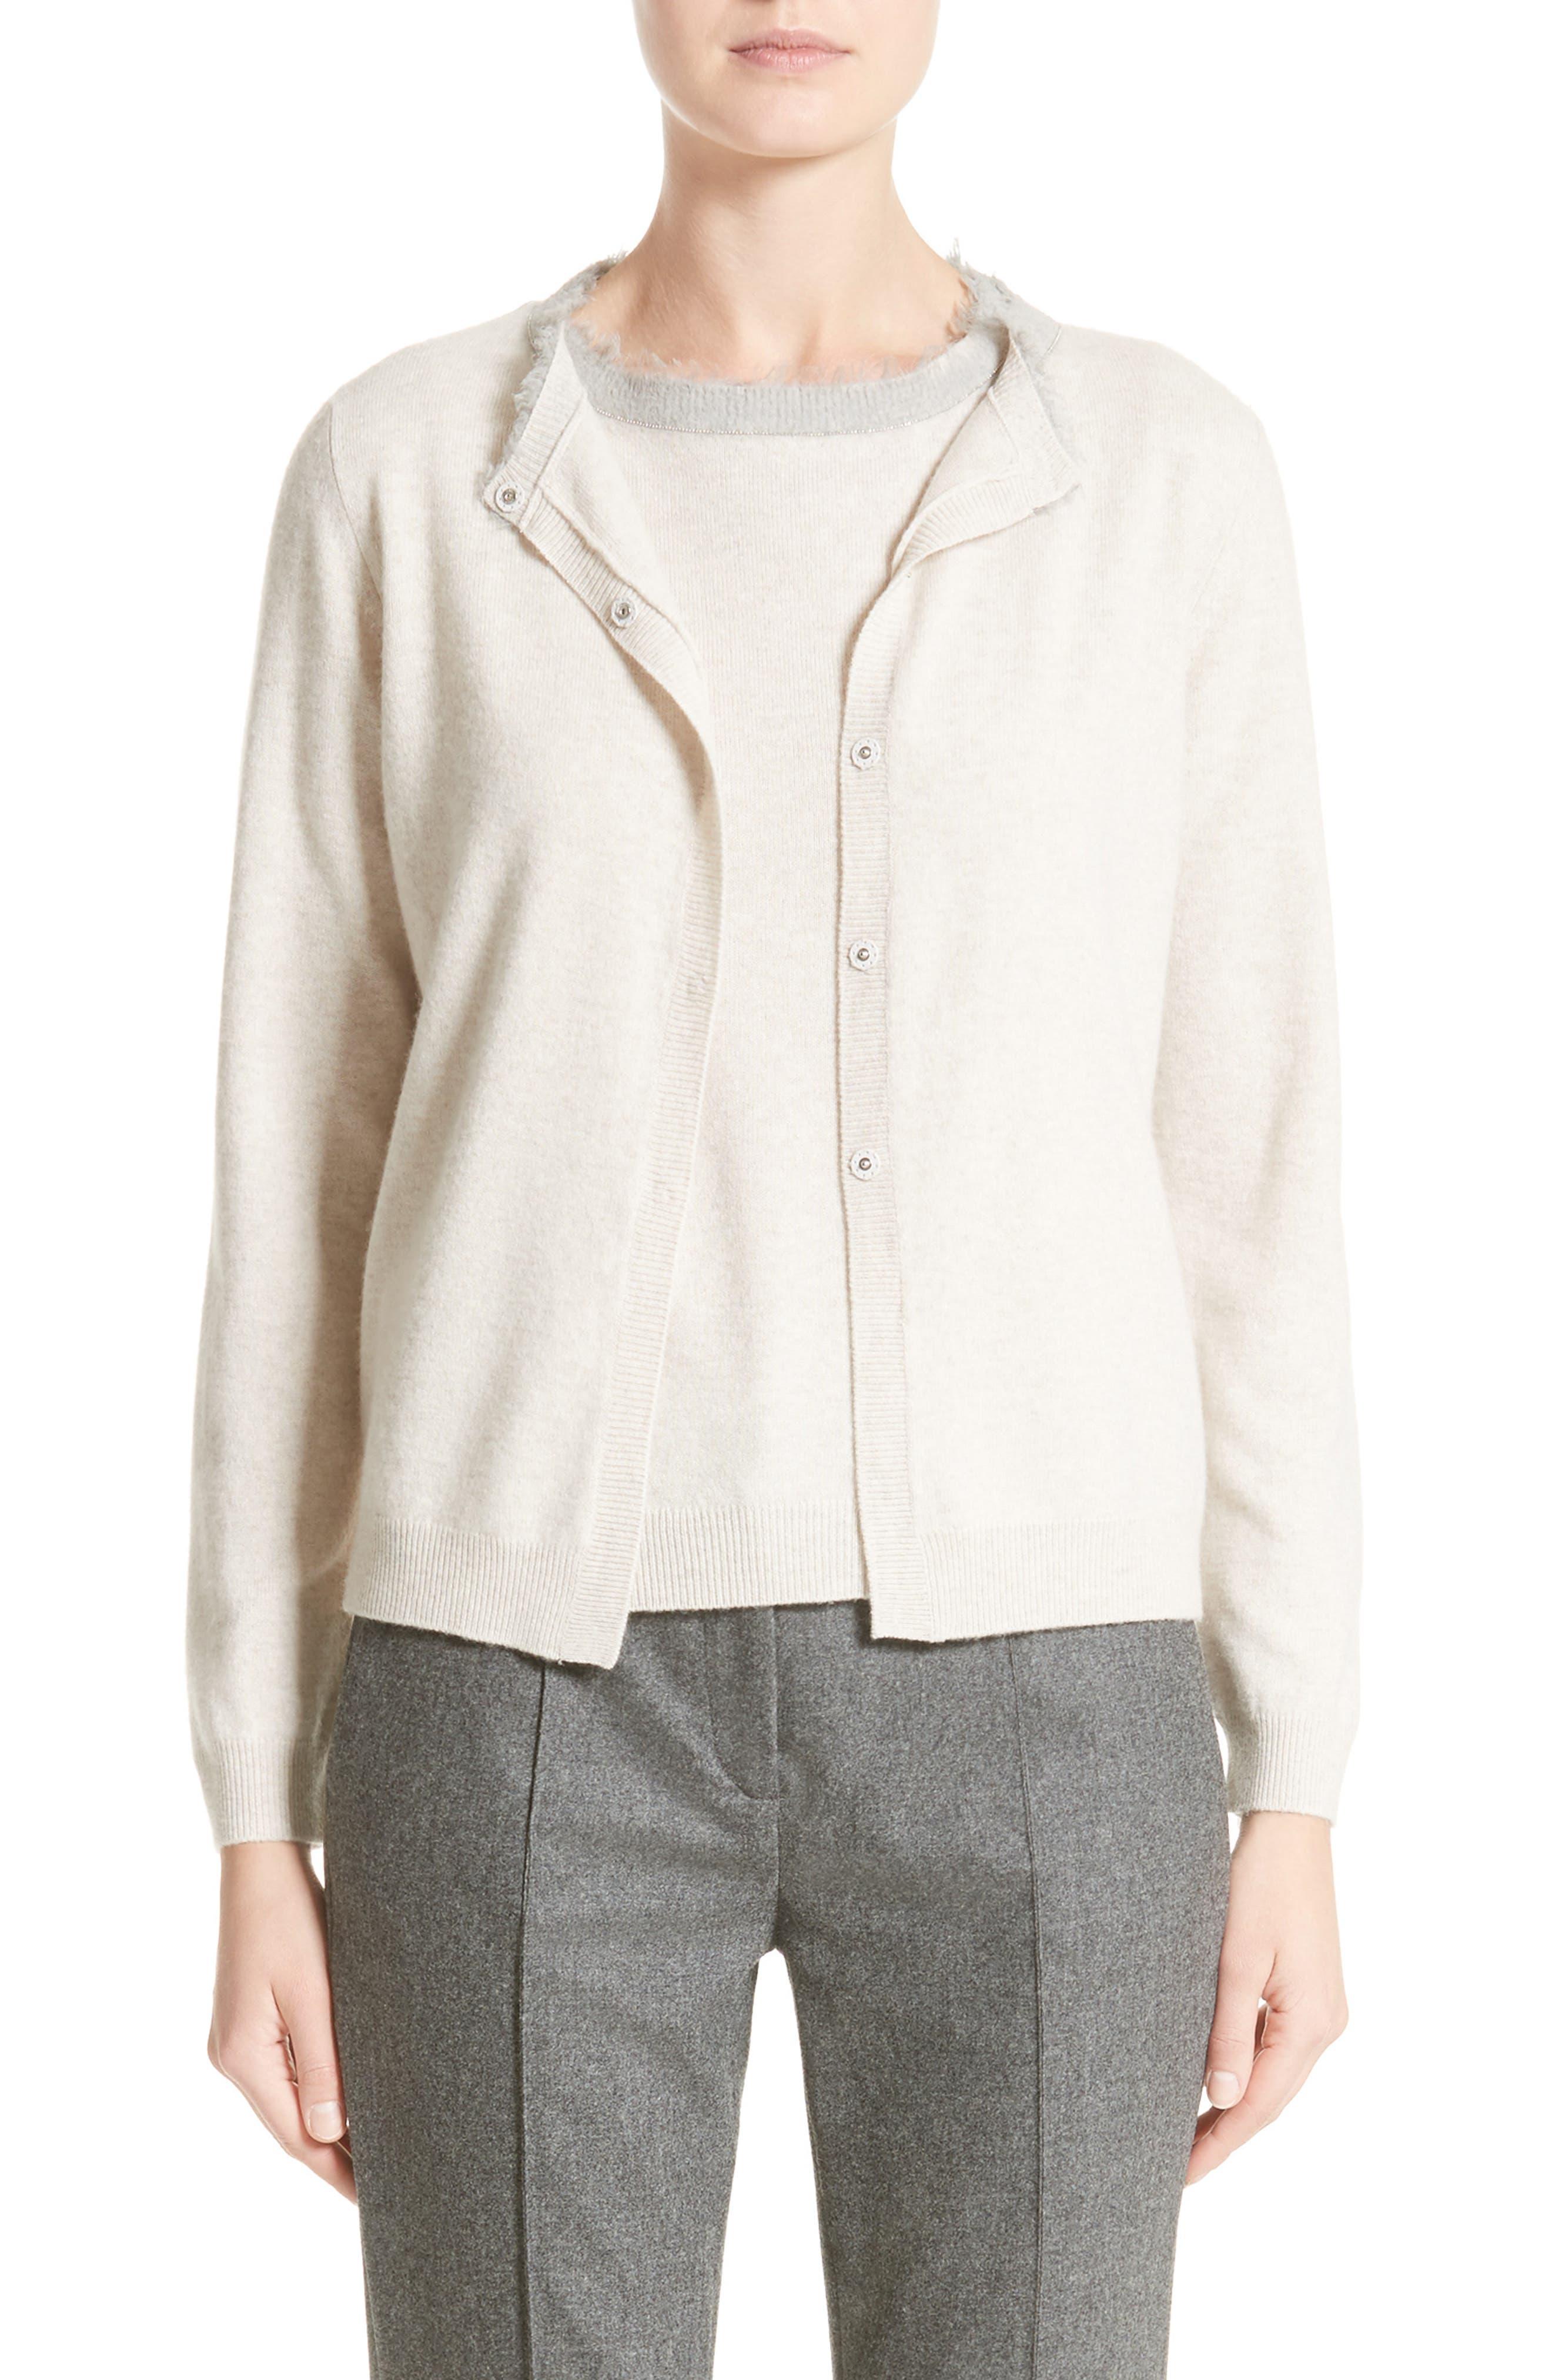 Fabiana Filippi Platinum Wool, Silk & Cashmere Cardigan